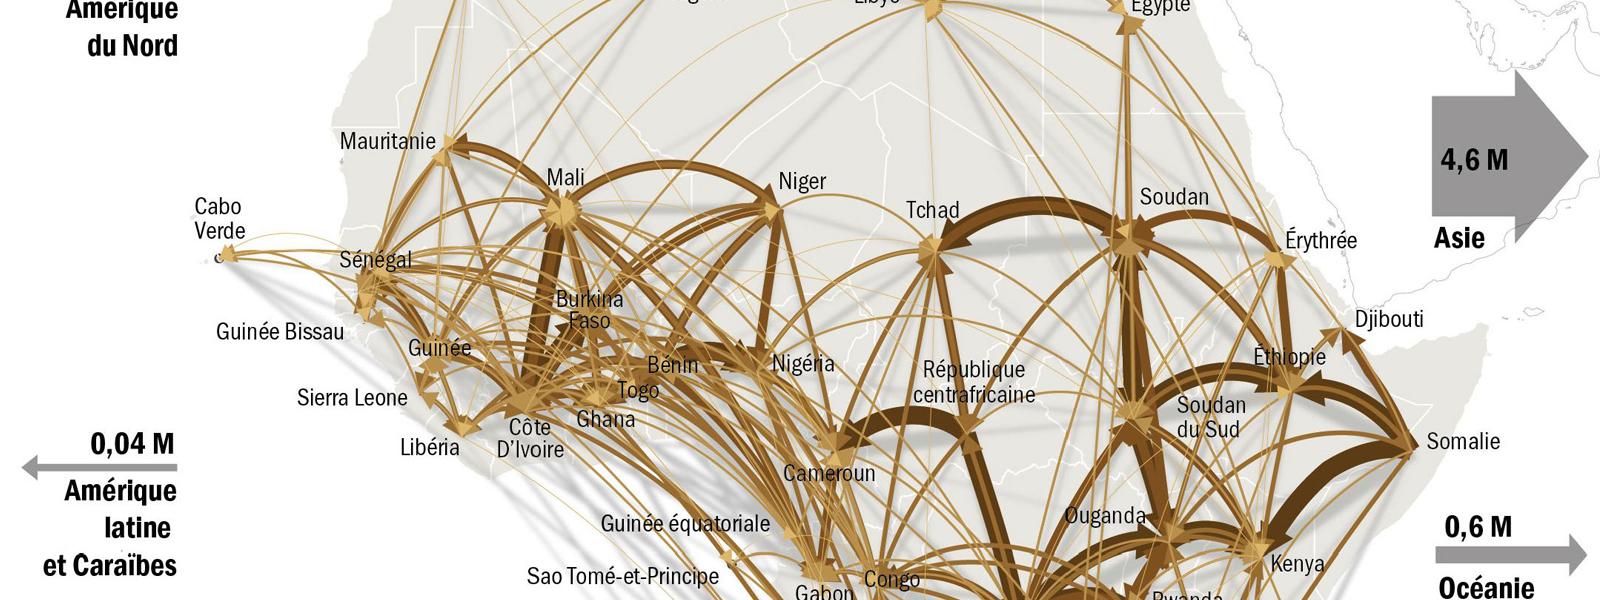 Slider 10 - Guillaume Sciaux - Cartographe professionnel